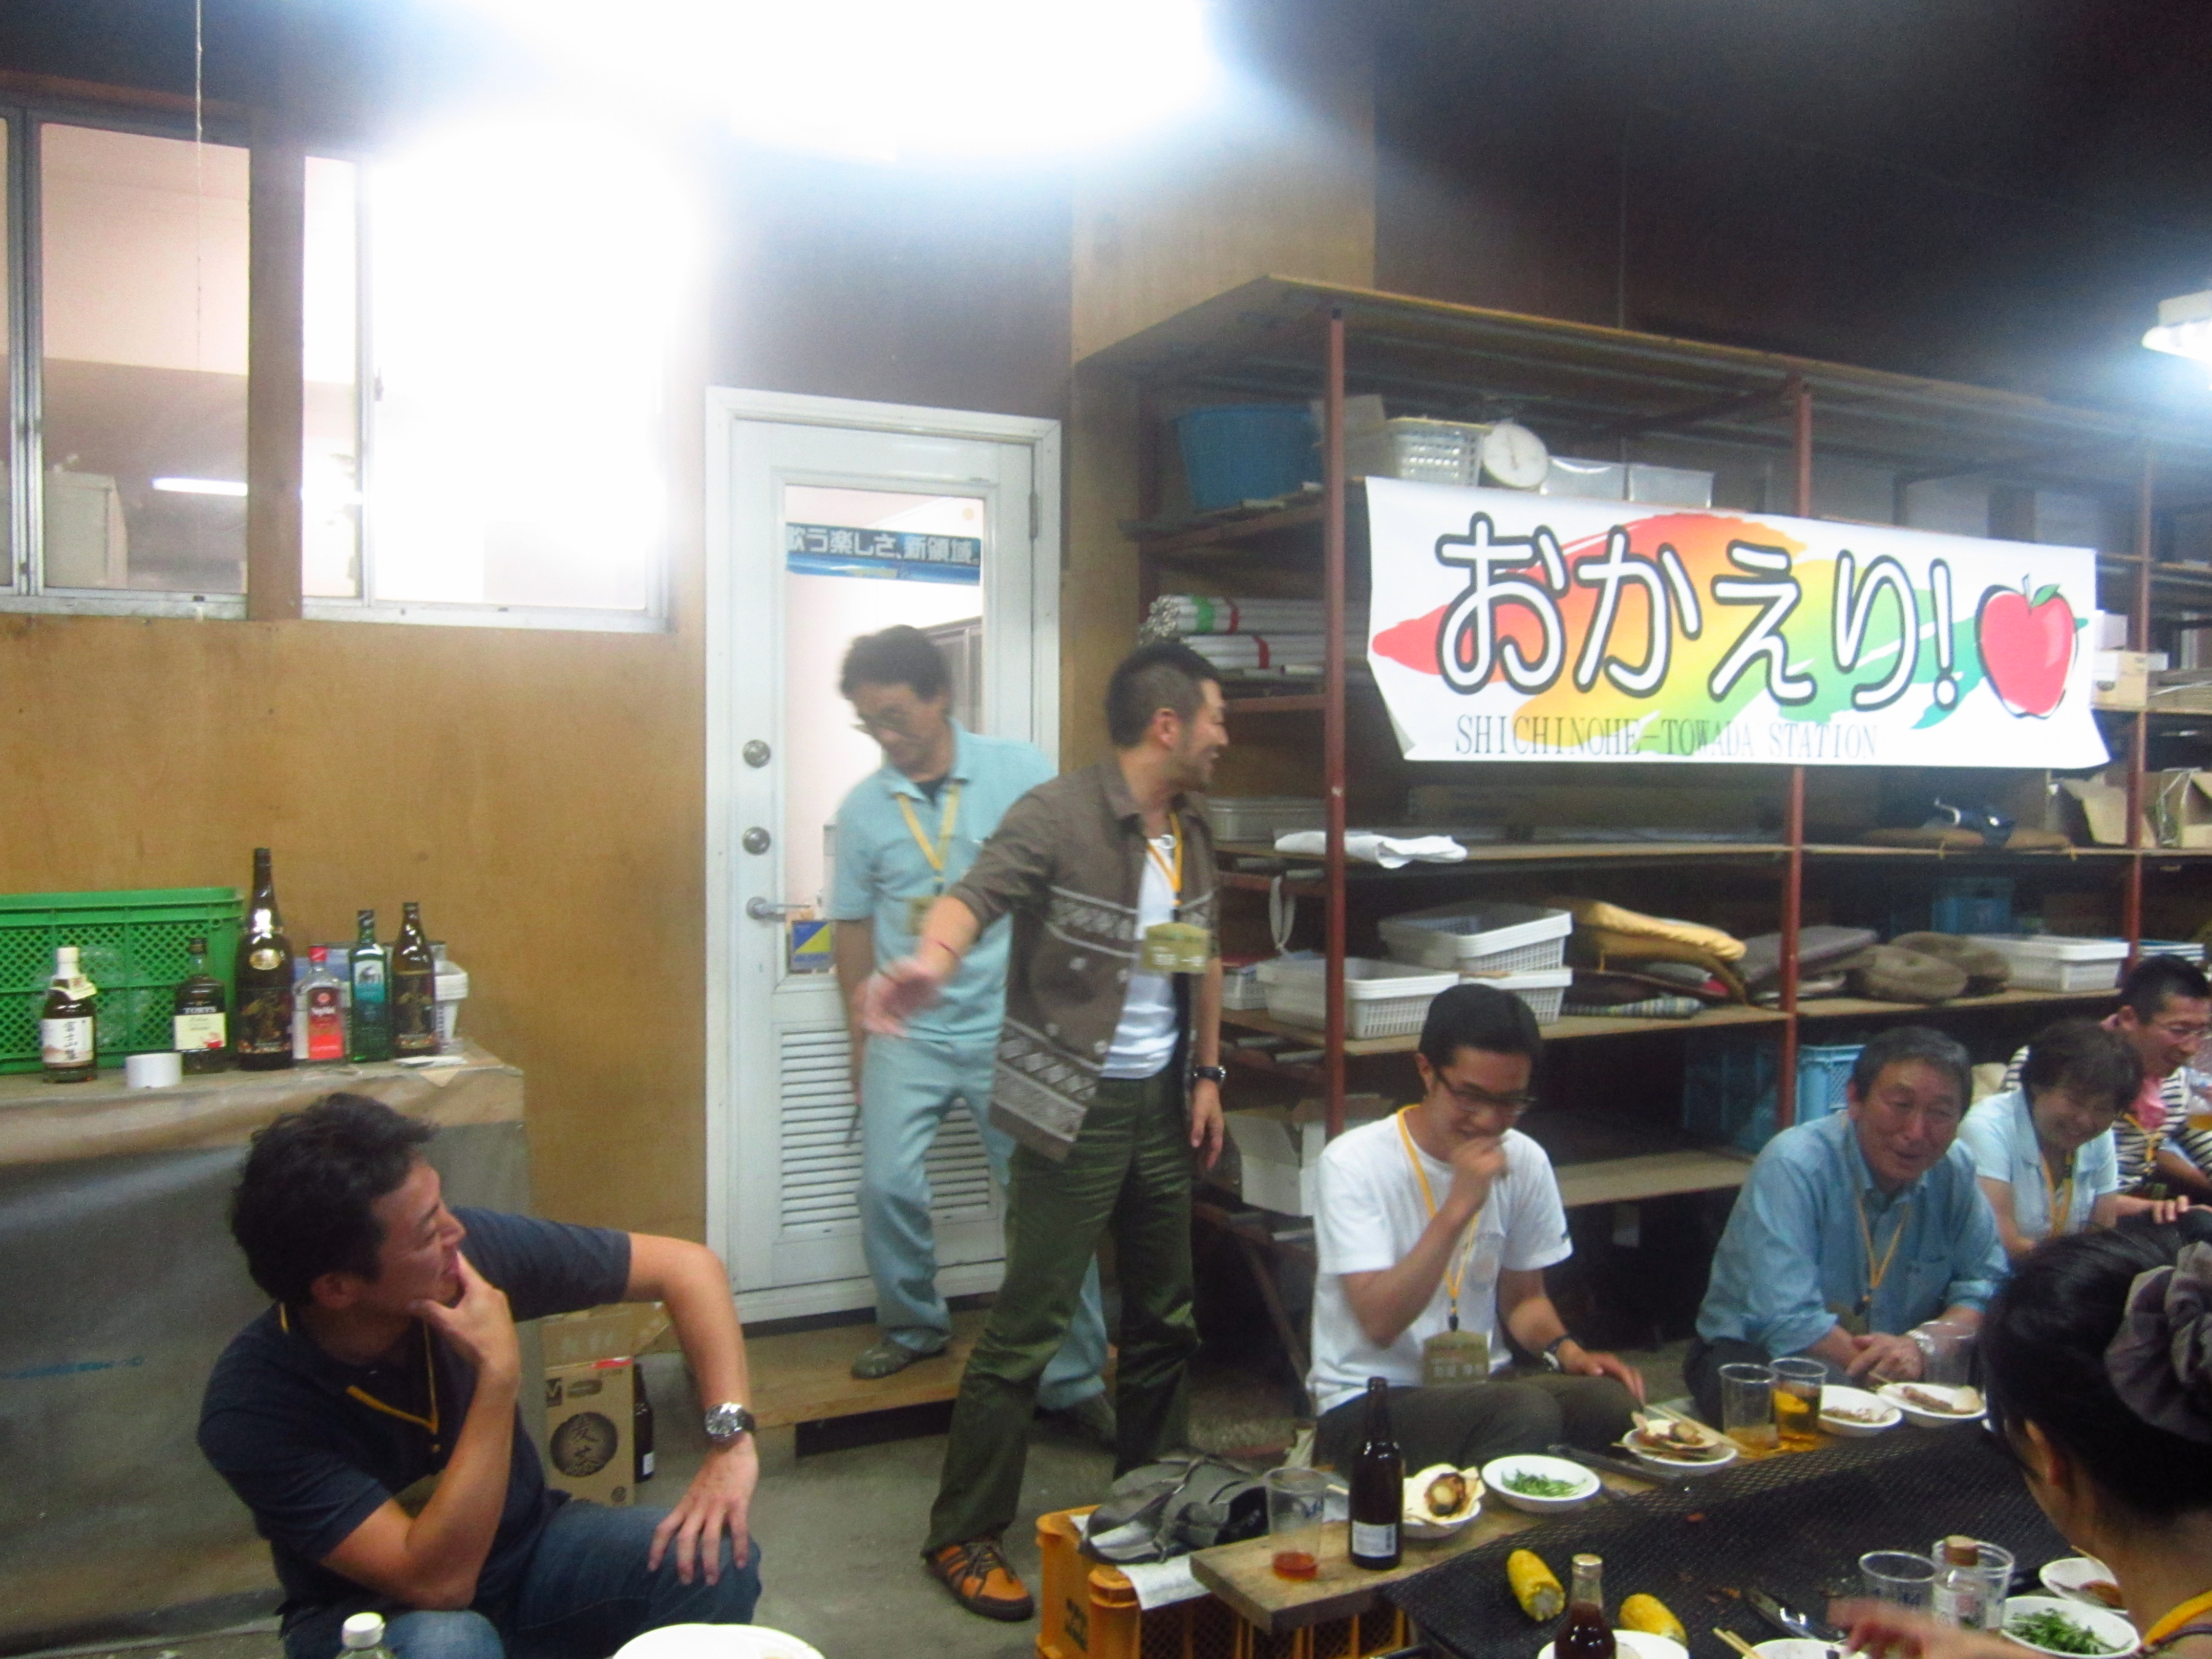 IMG 4383 - 麻布十番納涼祭り25,26日(七戸町出店)